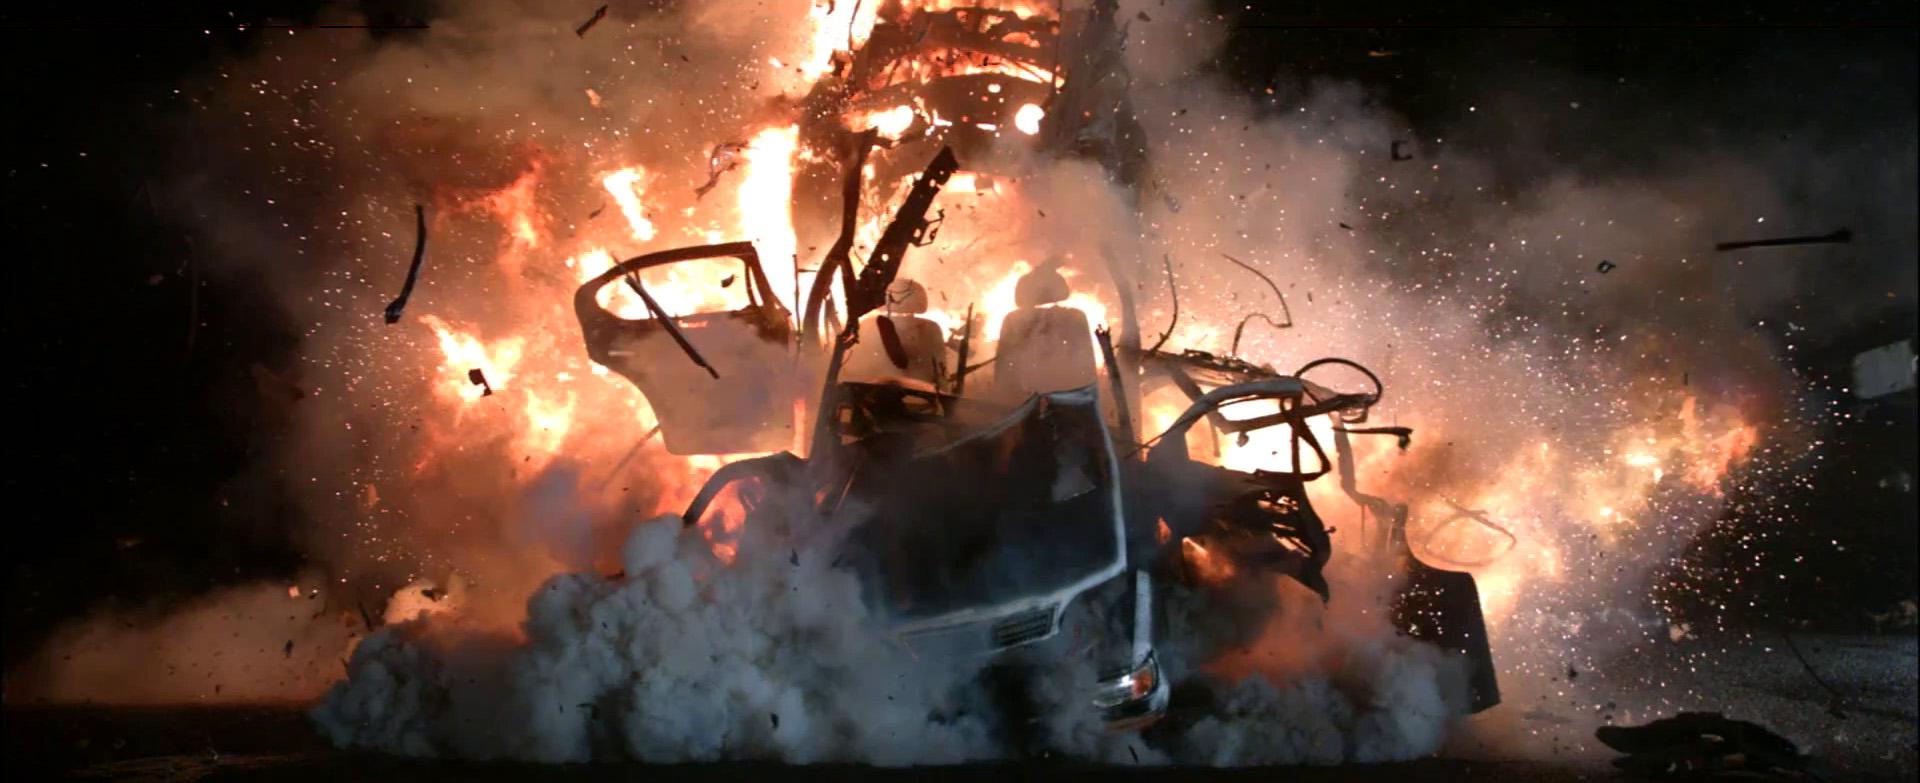 Car Explosion Test #1 - for 'Blackhat'